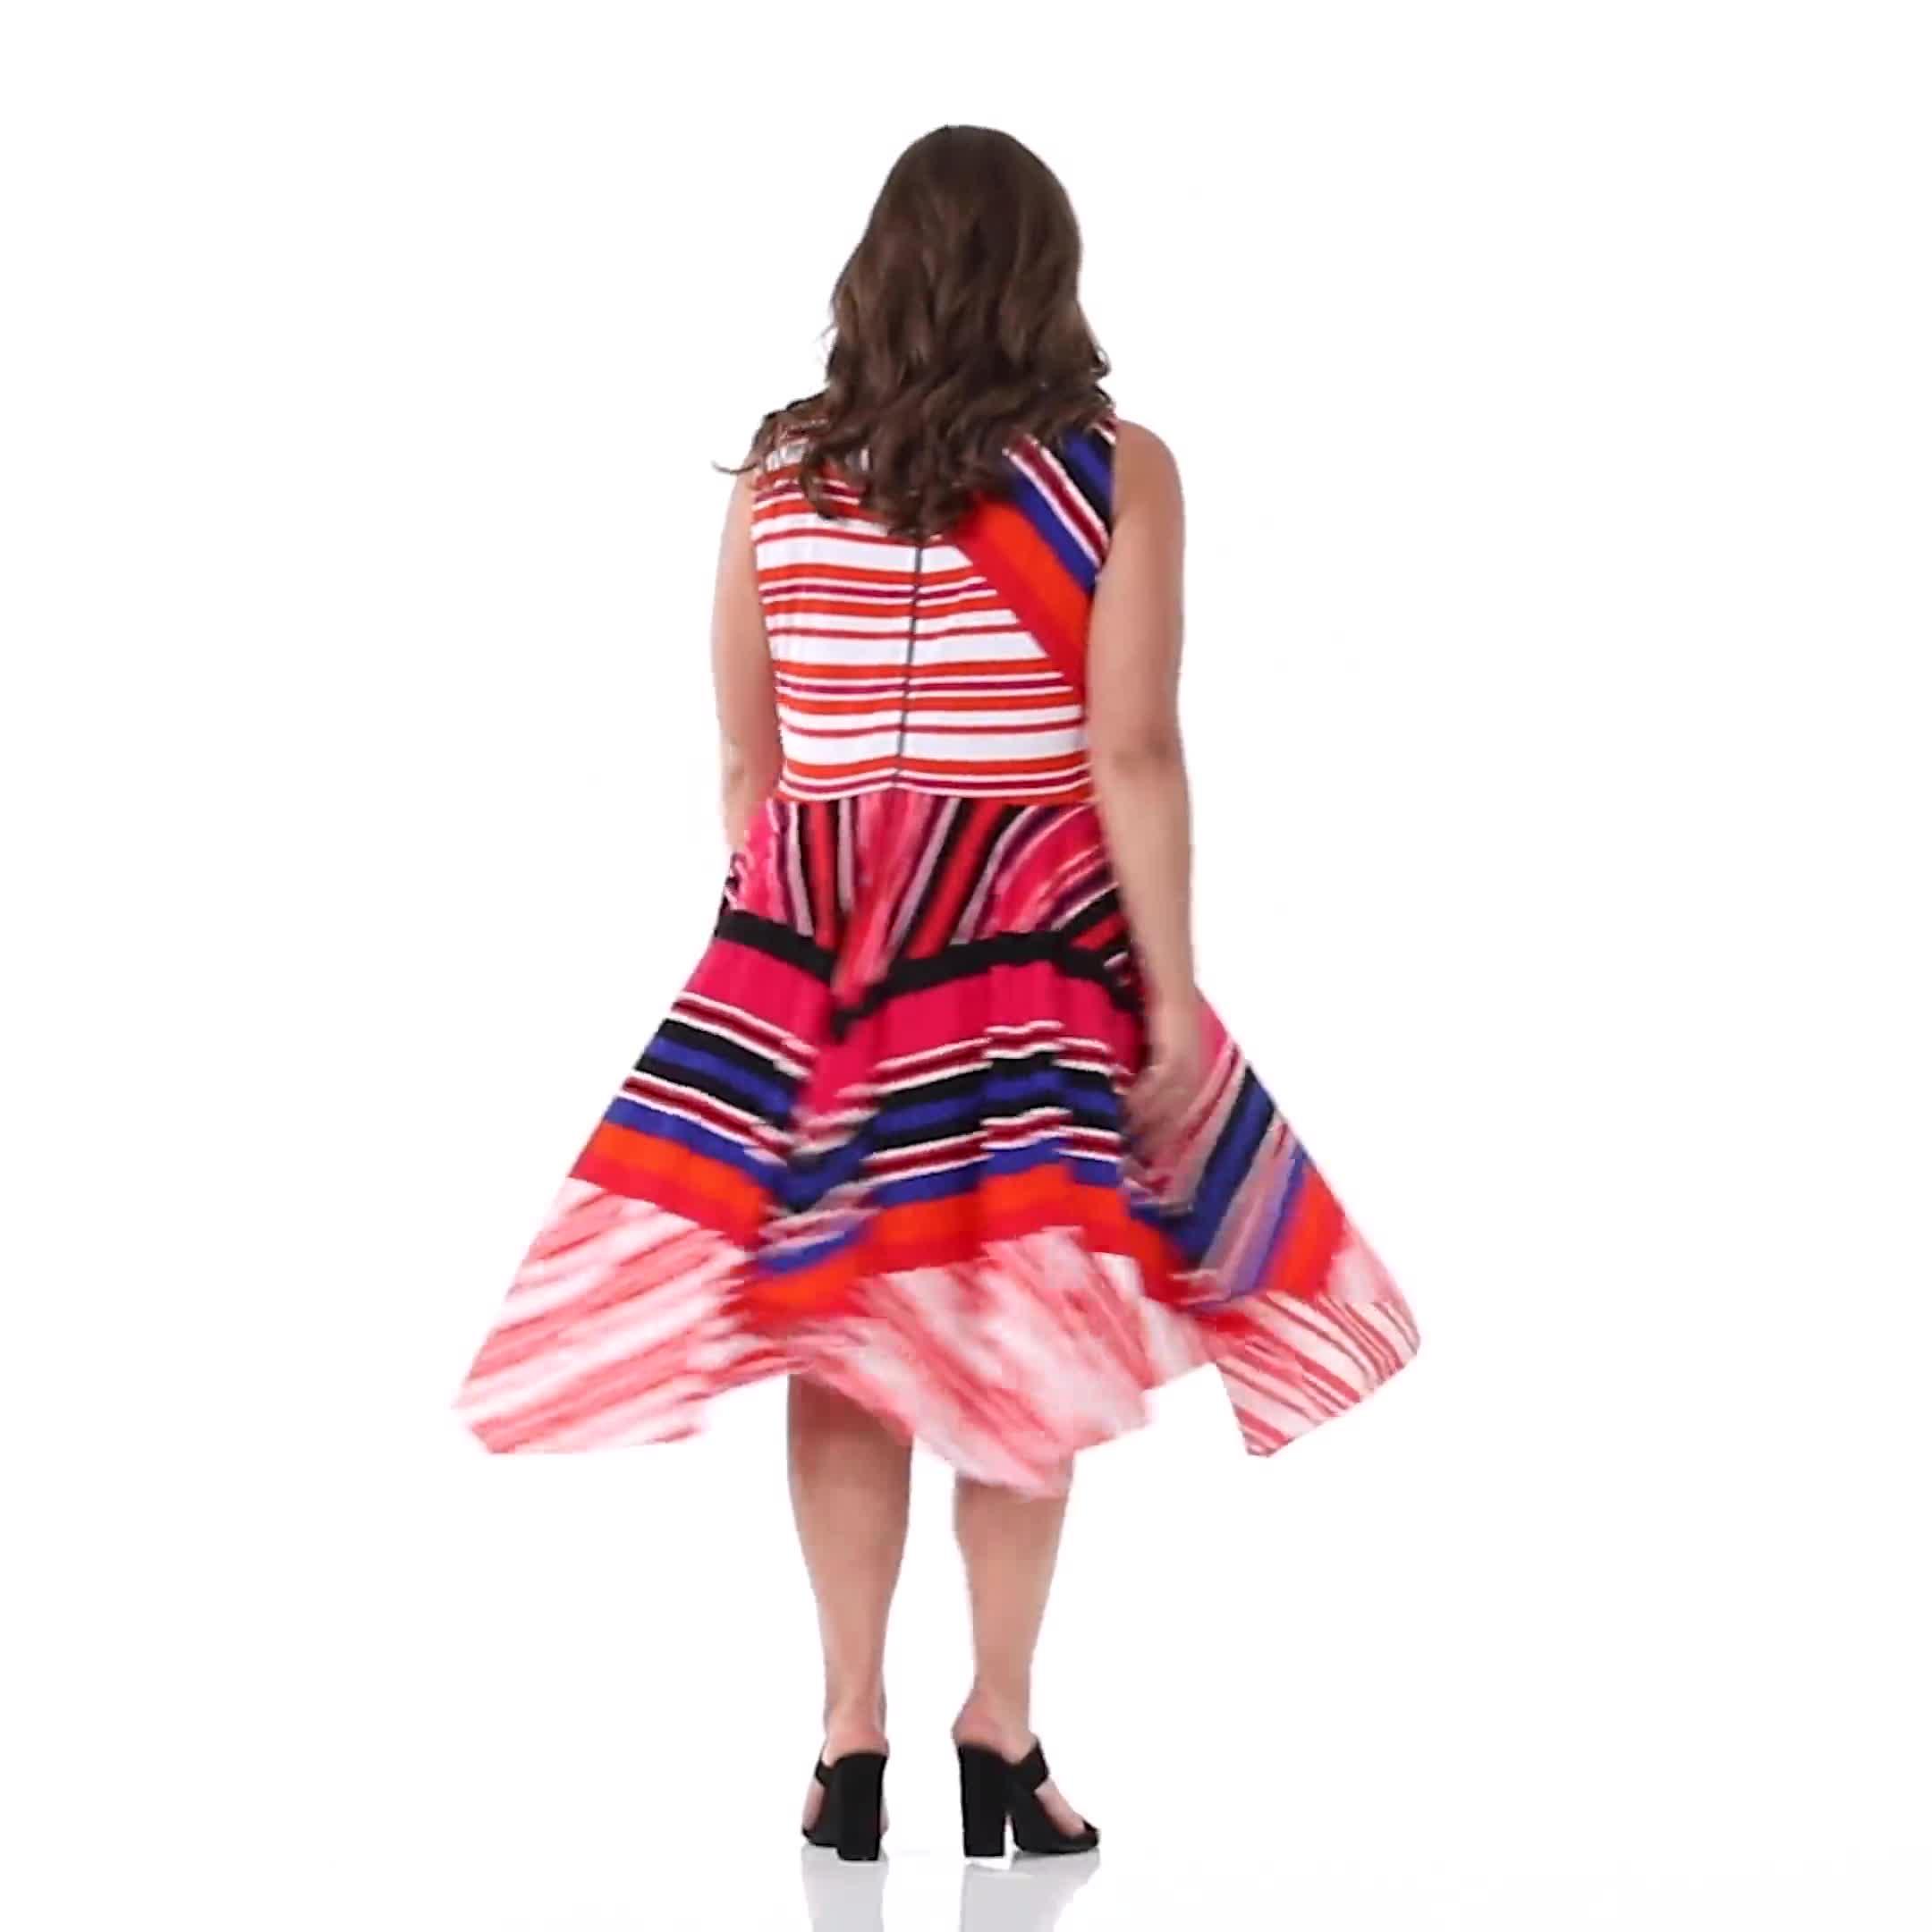 Sleeveless Striped Colorful Dress - Plus - Video